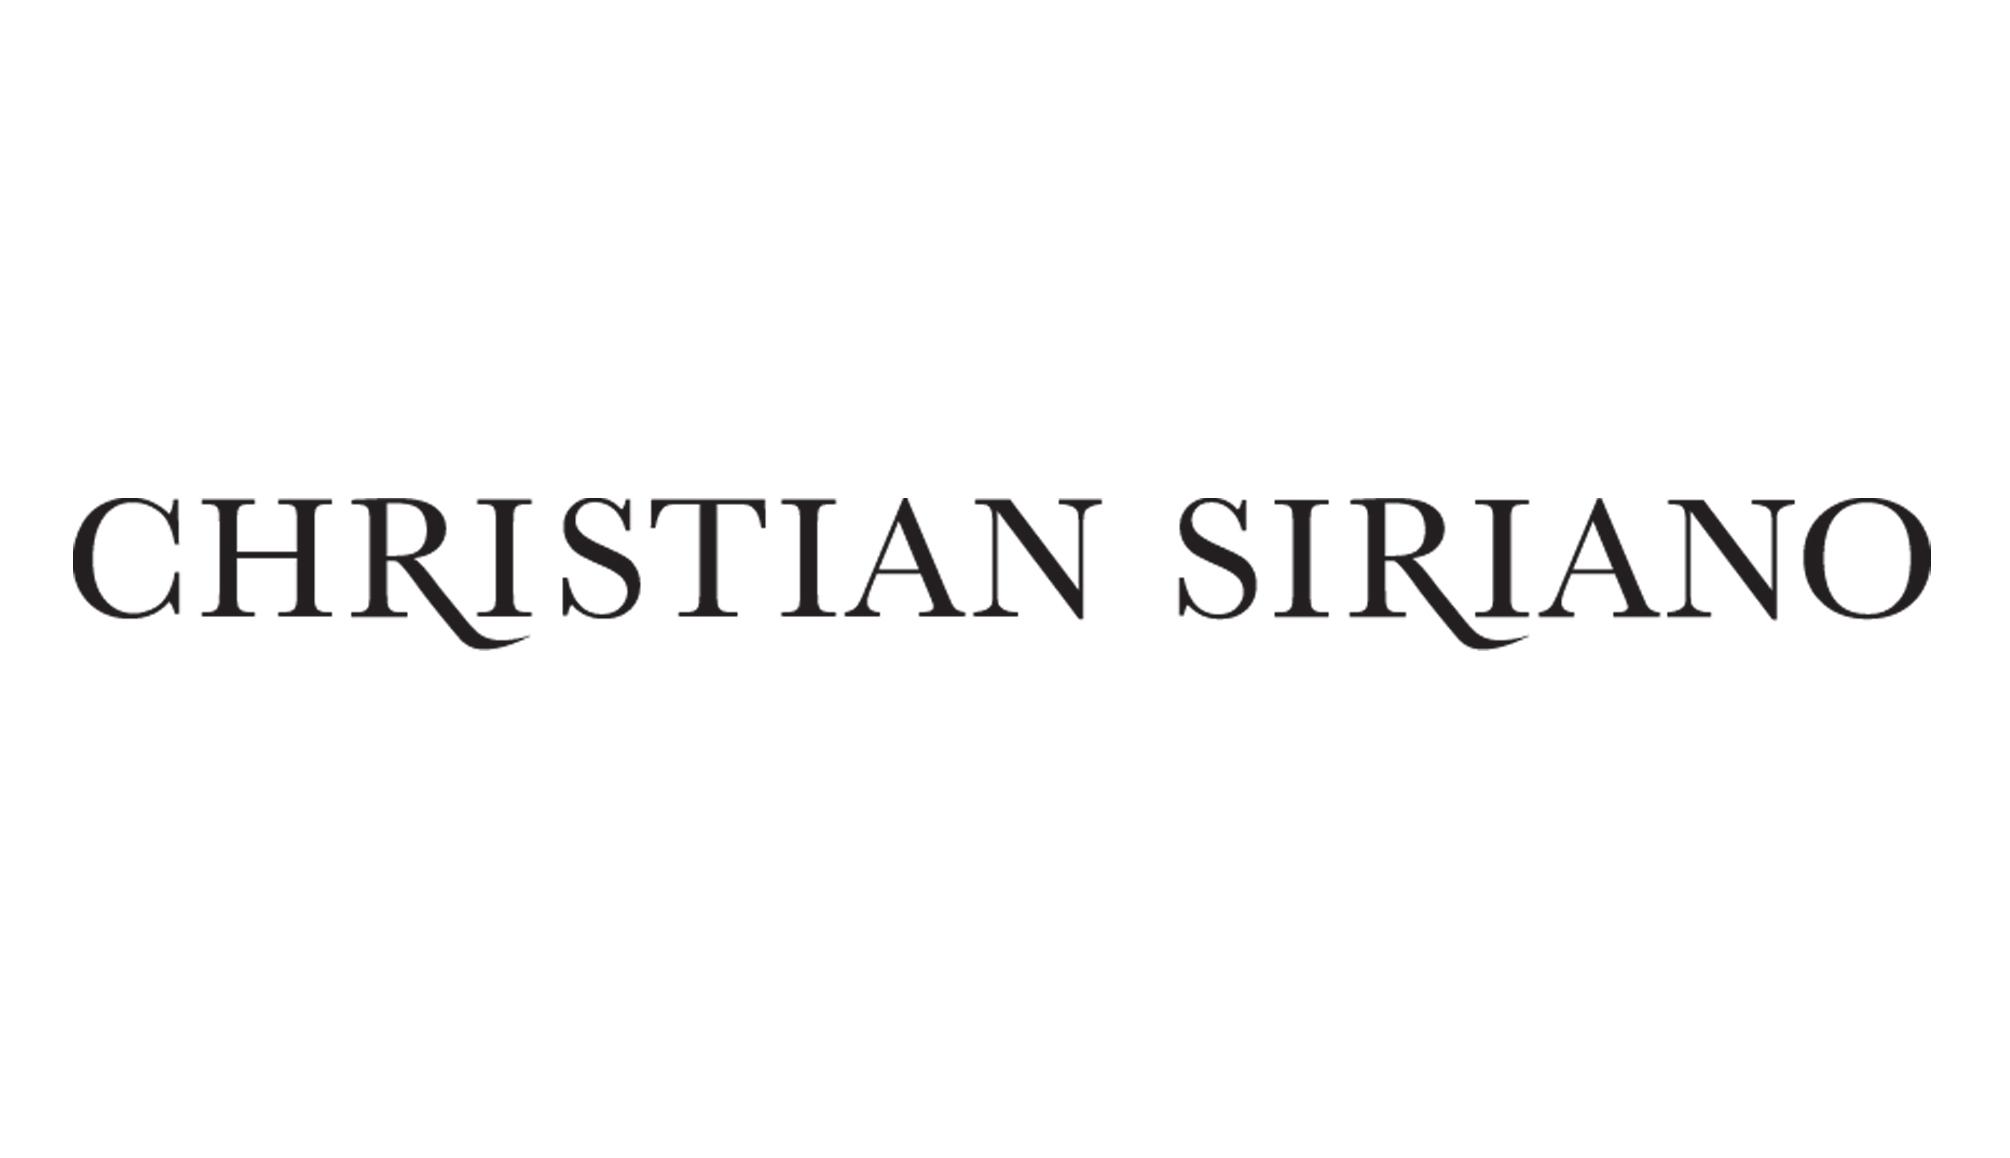 كريستيان سيريانو Christian Siriano